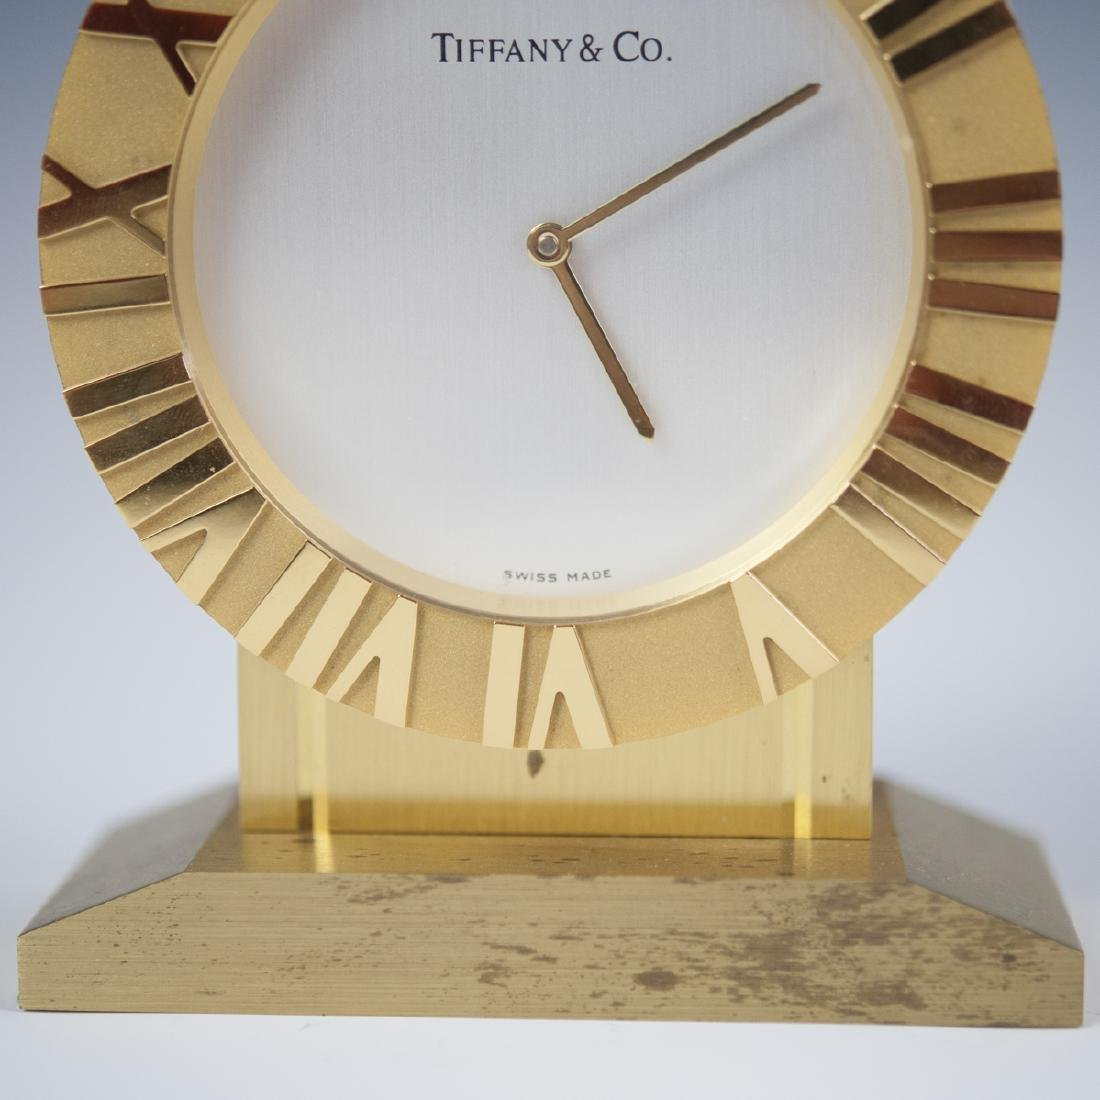 Tiffany & Co. Gilt Brass Desk Clock - 4